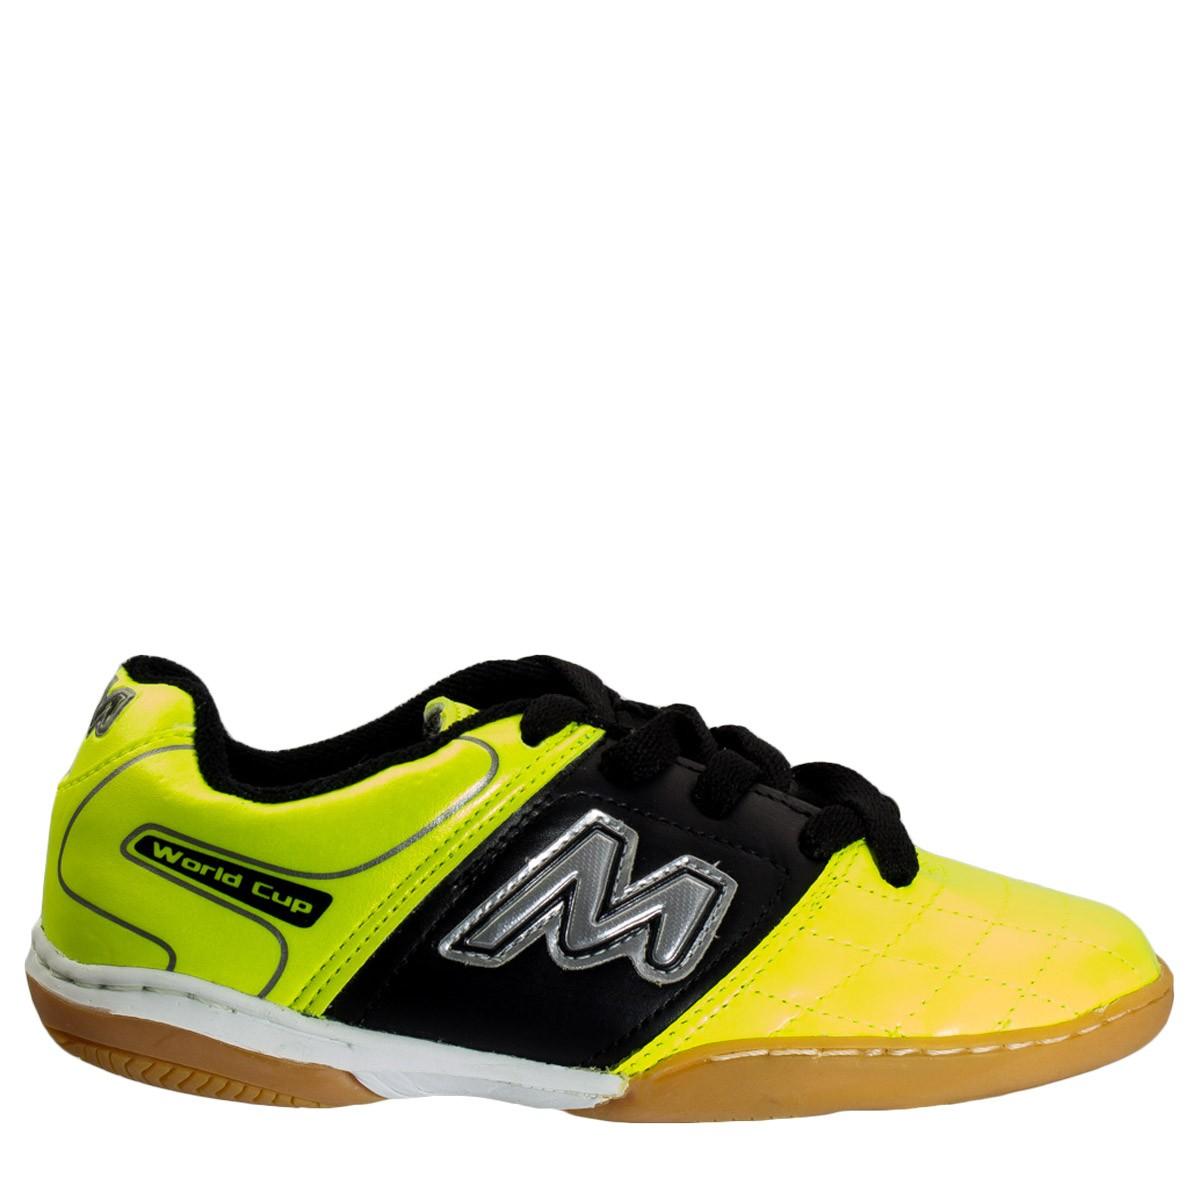 8a9f8e17c Bizz Store - Chuteira Infantil Menino Futsal Mathaus Itália